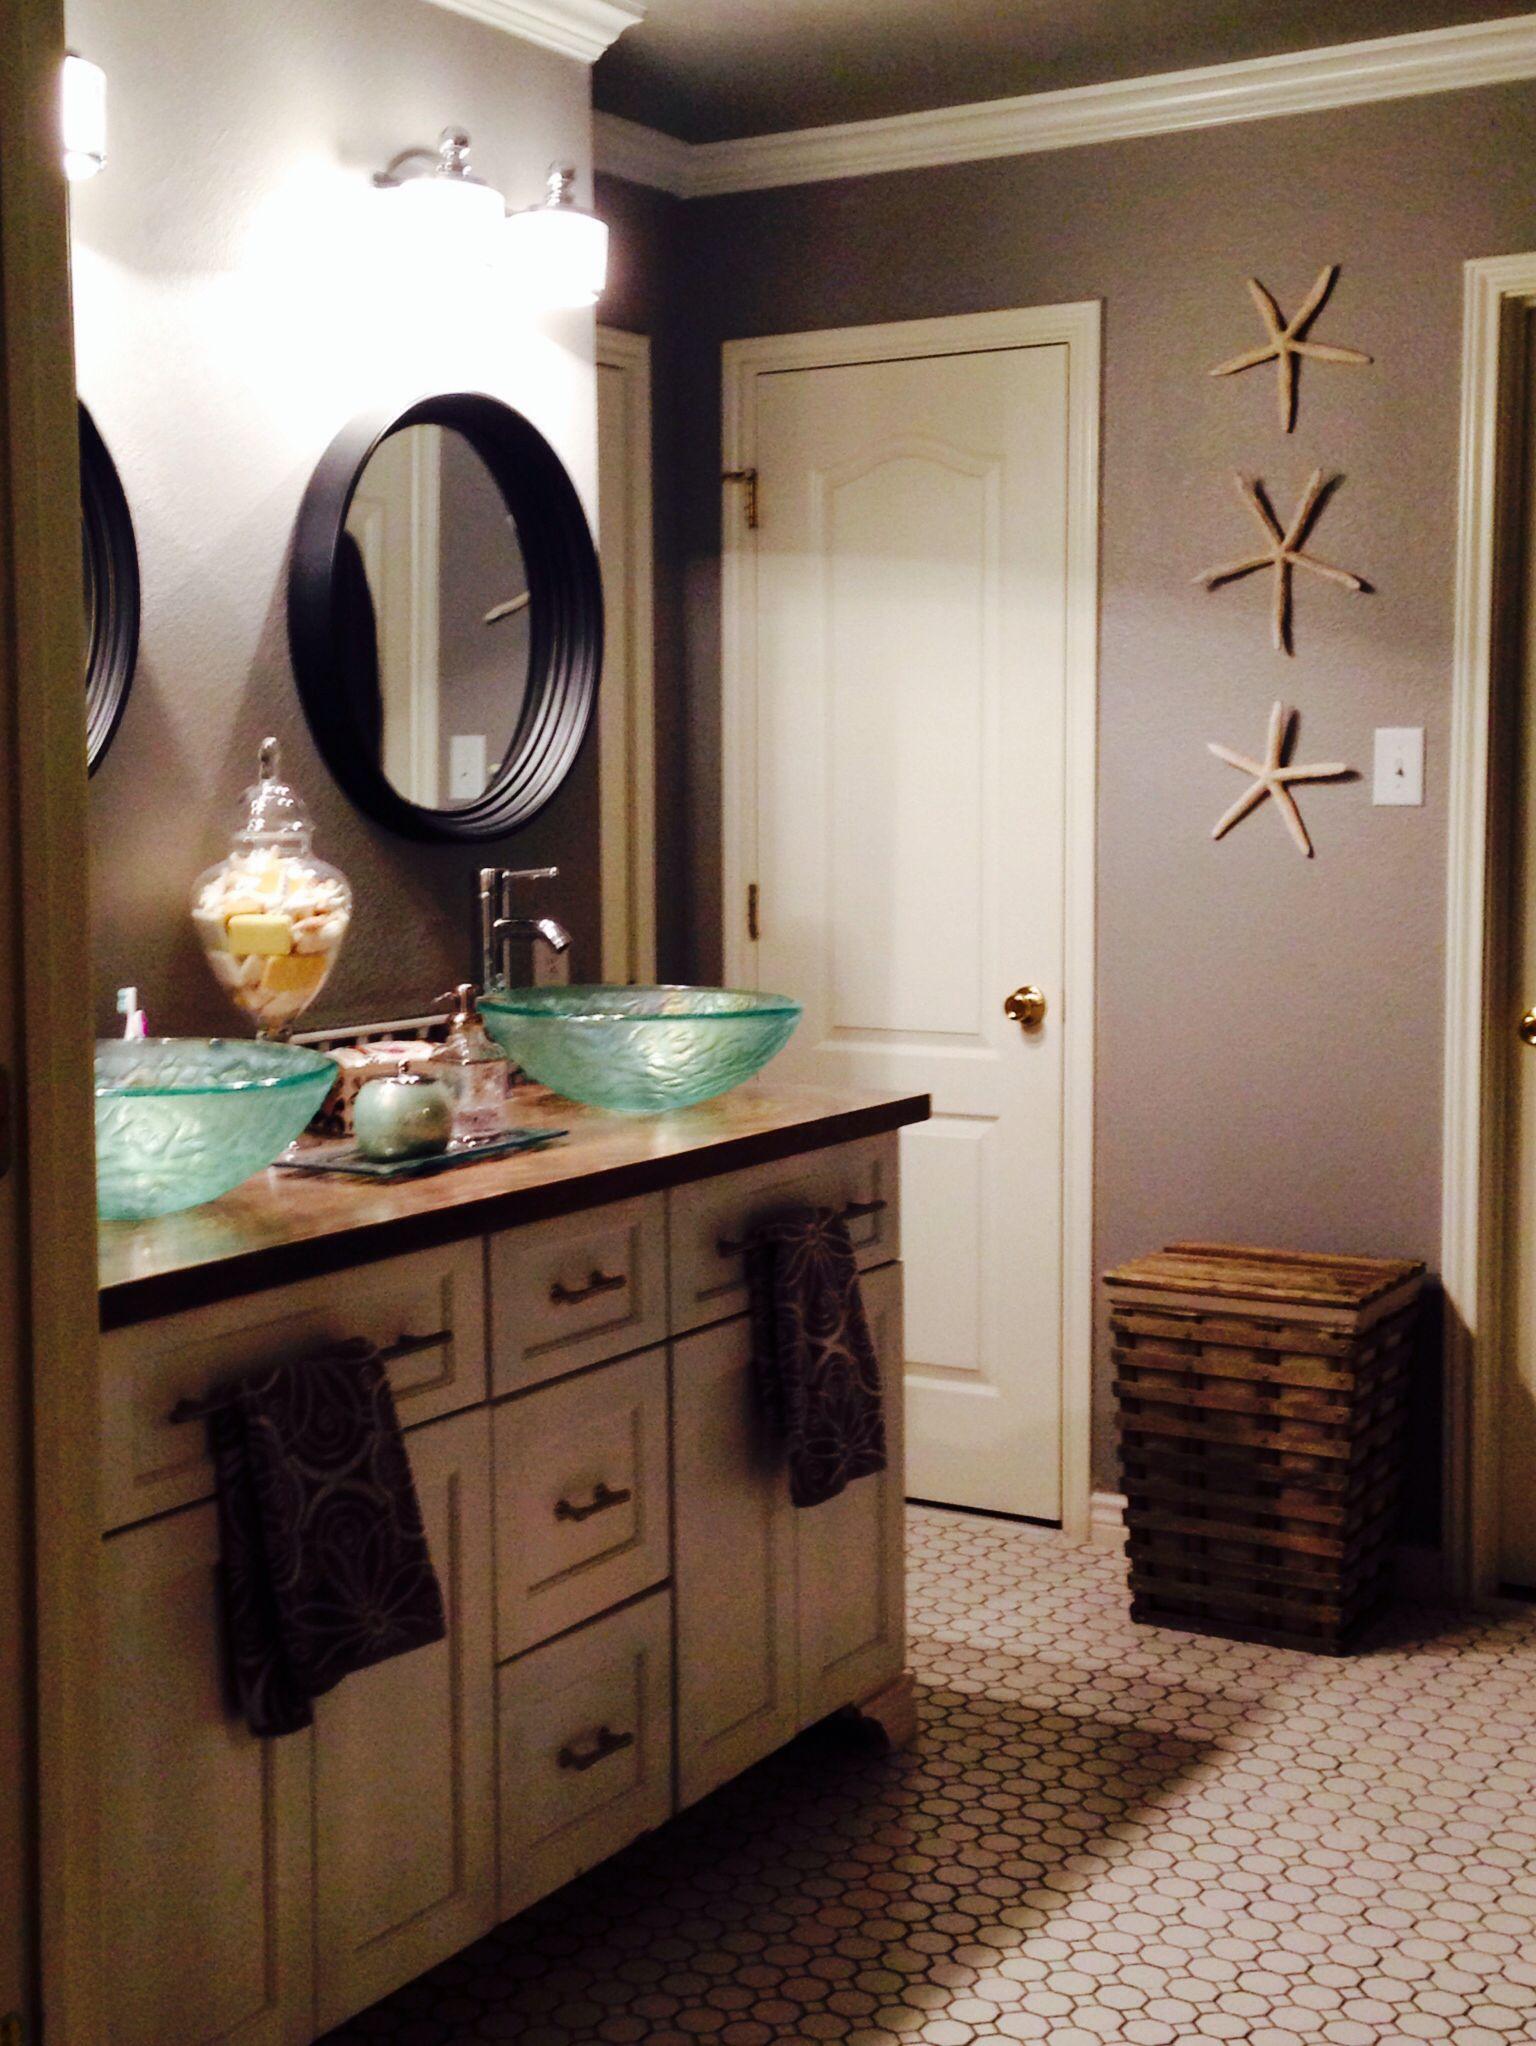 diy bathroom remodel on a budget inexpensive bathroom on bathroom renovation ideas diy id=15638